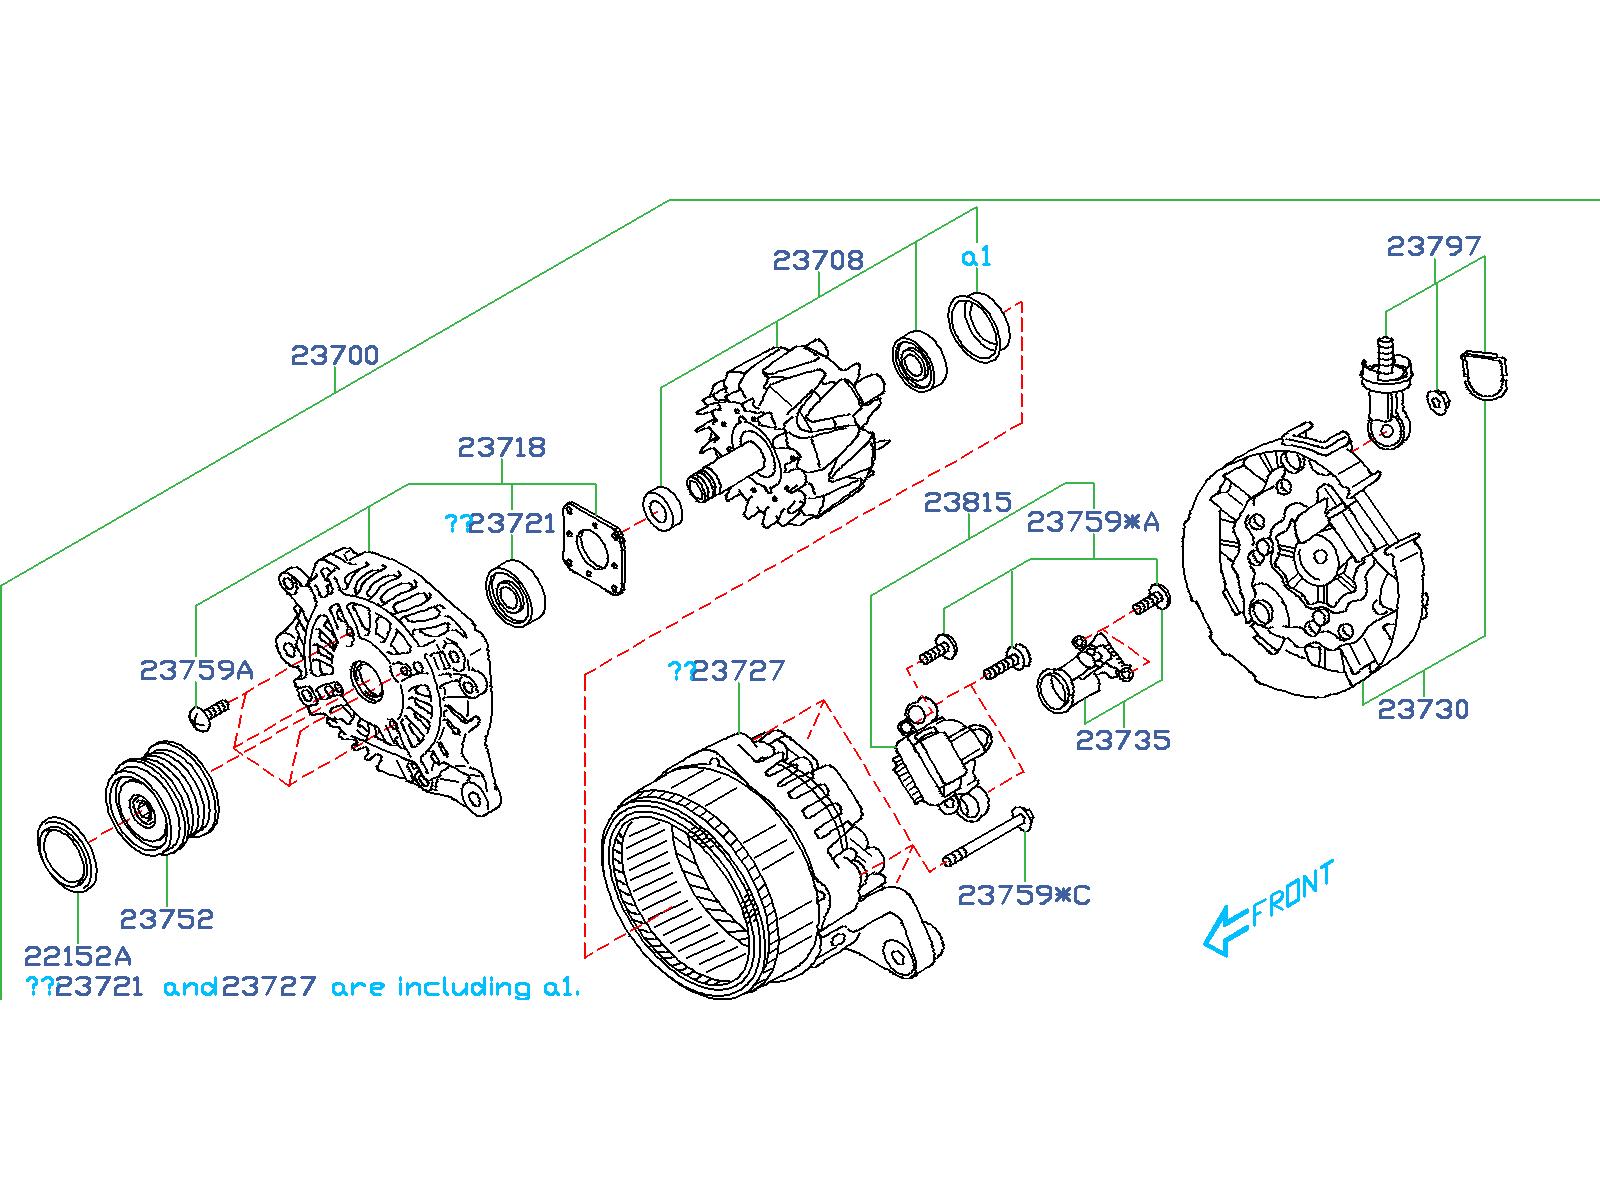 Subaru Forester Alternator Diagram